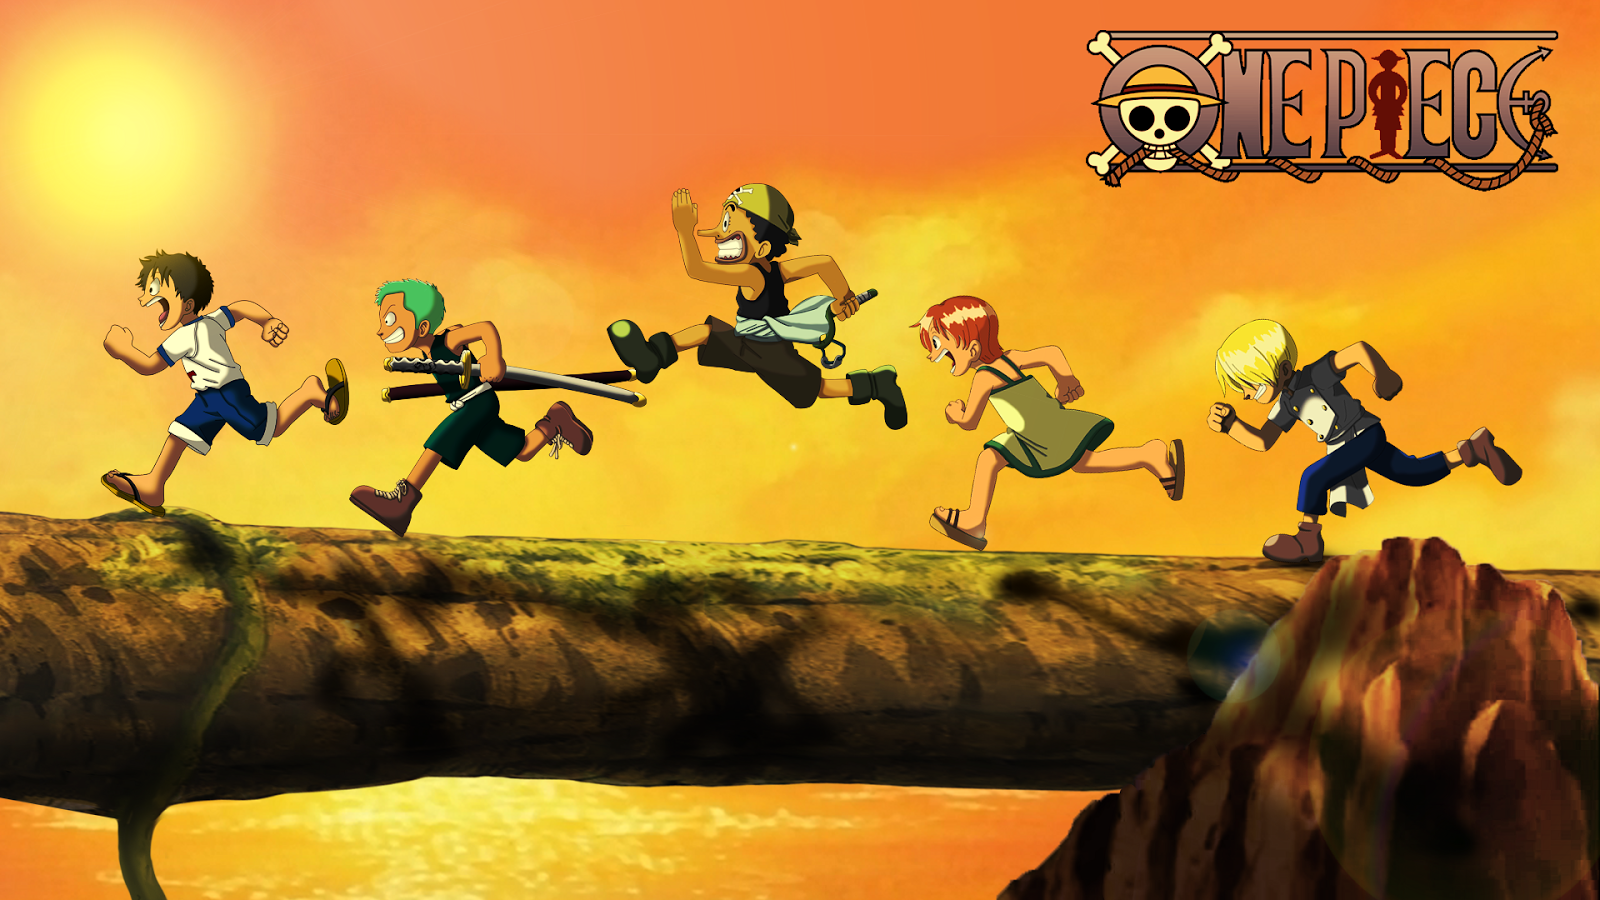 Luffy Zoro Usopp Nami And Sanji As Kids One Piece